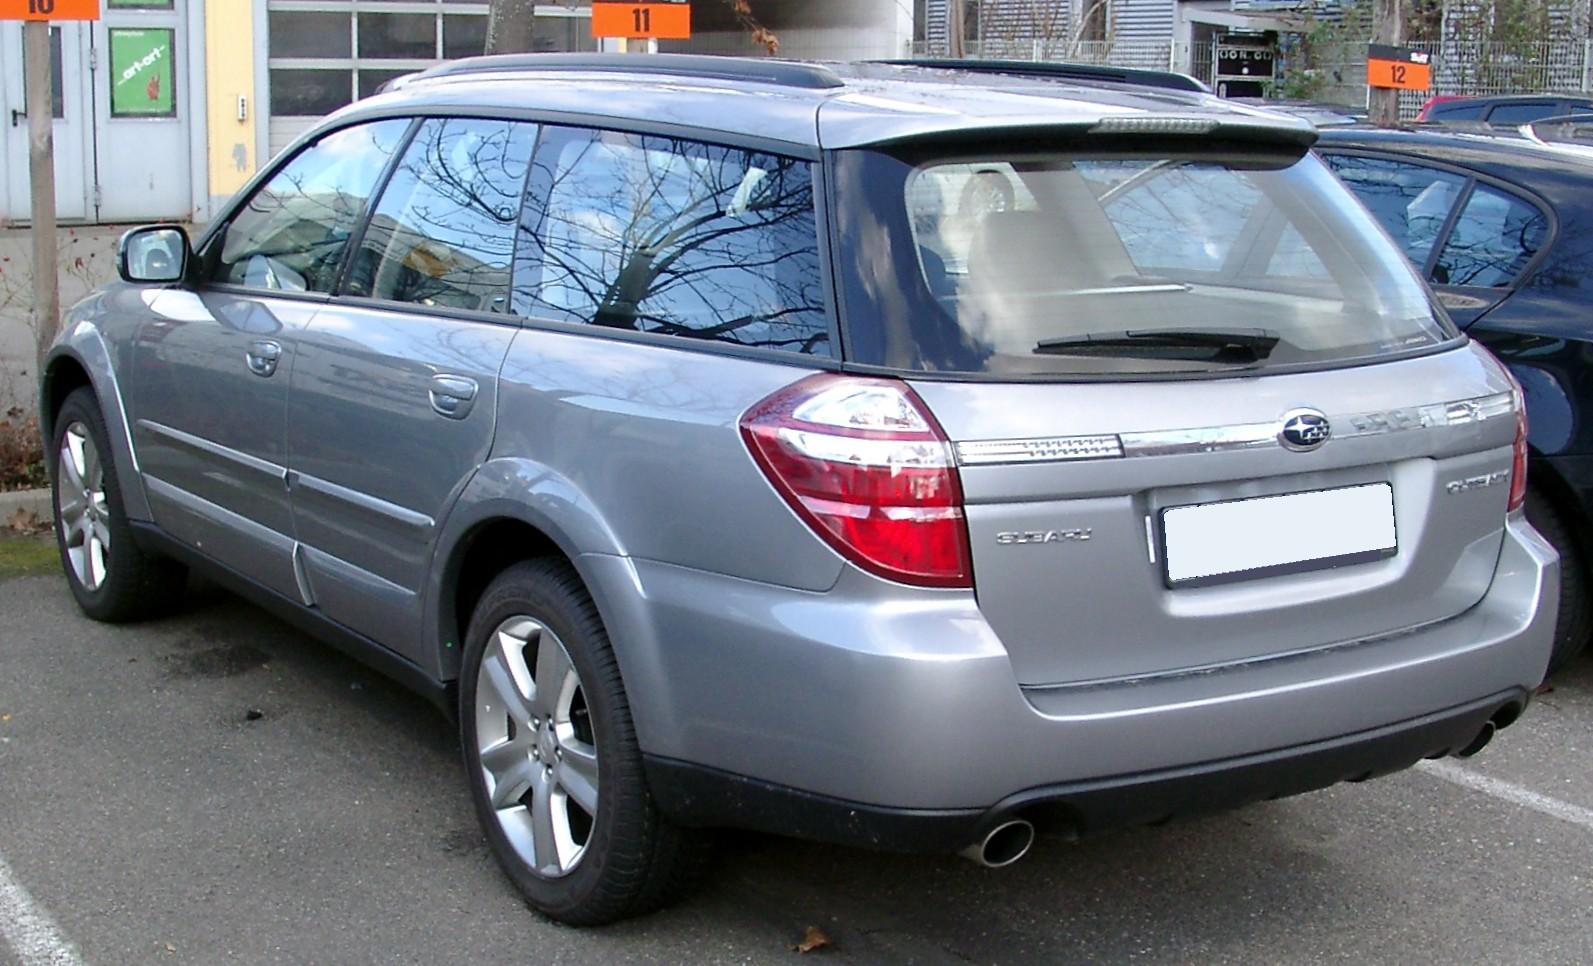 Description Subaru Outback rear 20080202.jpg